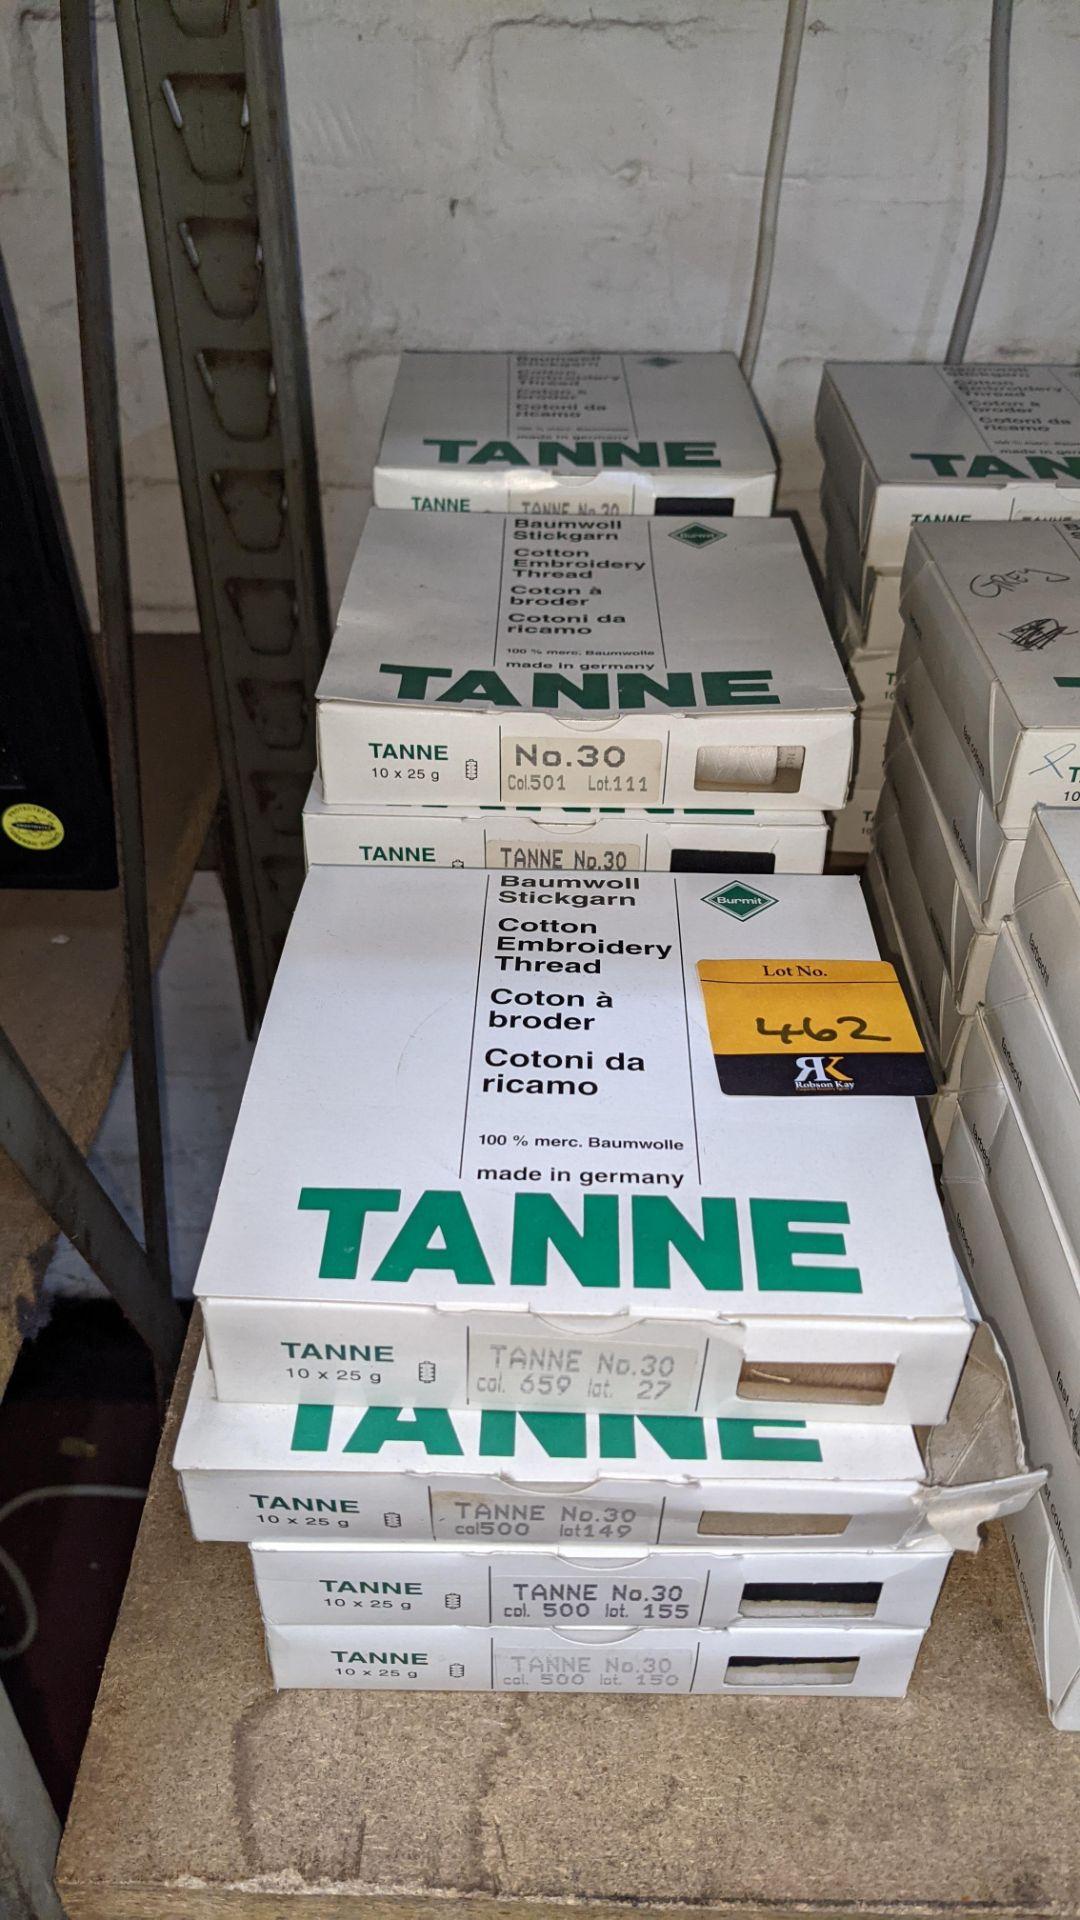 14 boxes of Madeira Tanne (Burmit) cotton embroidery thread